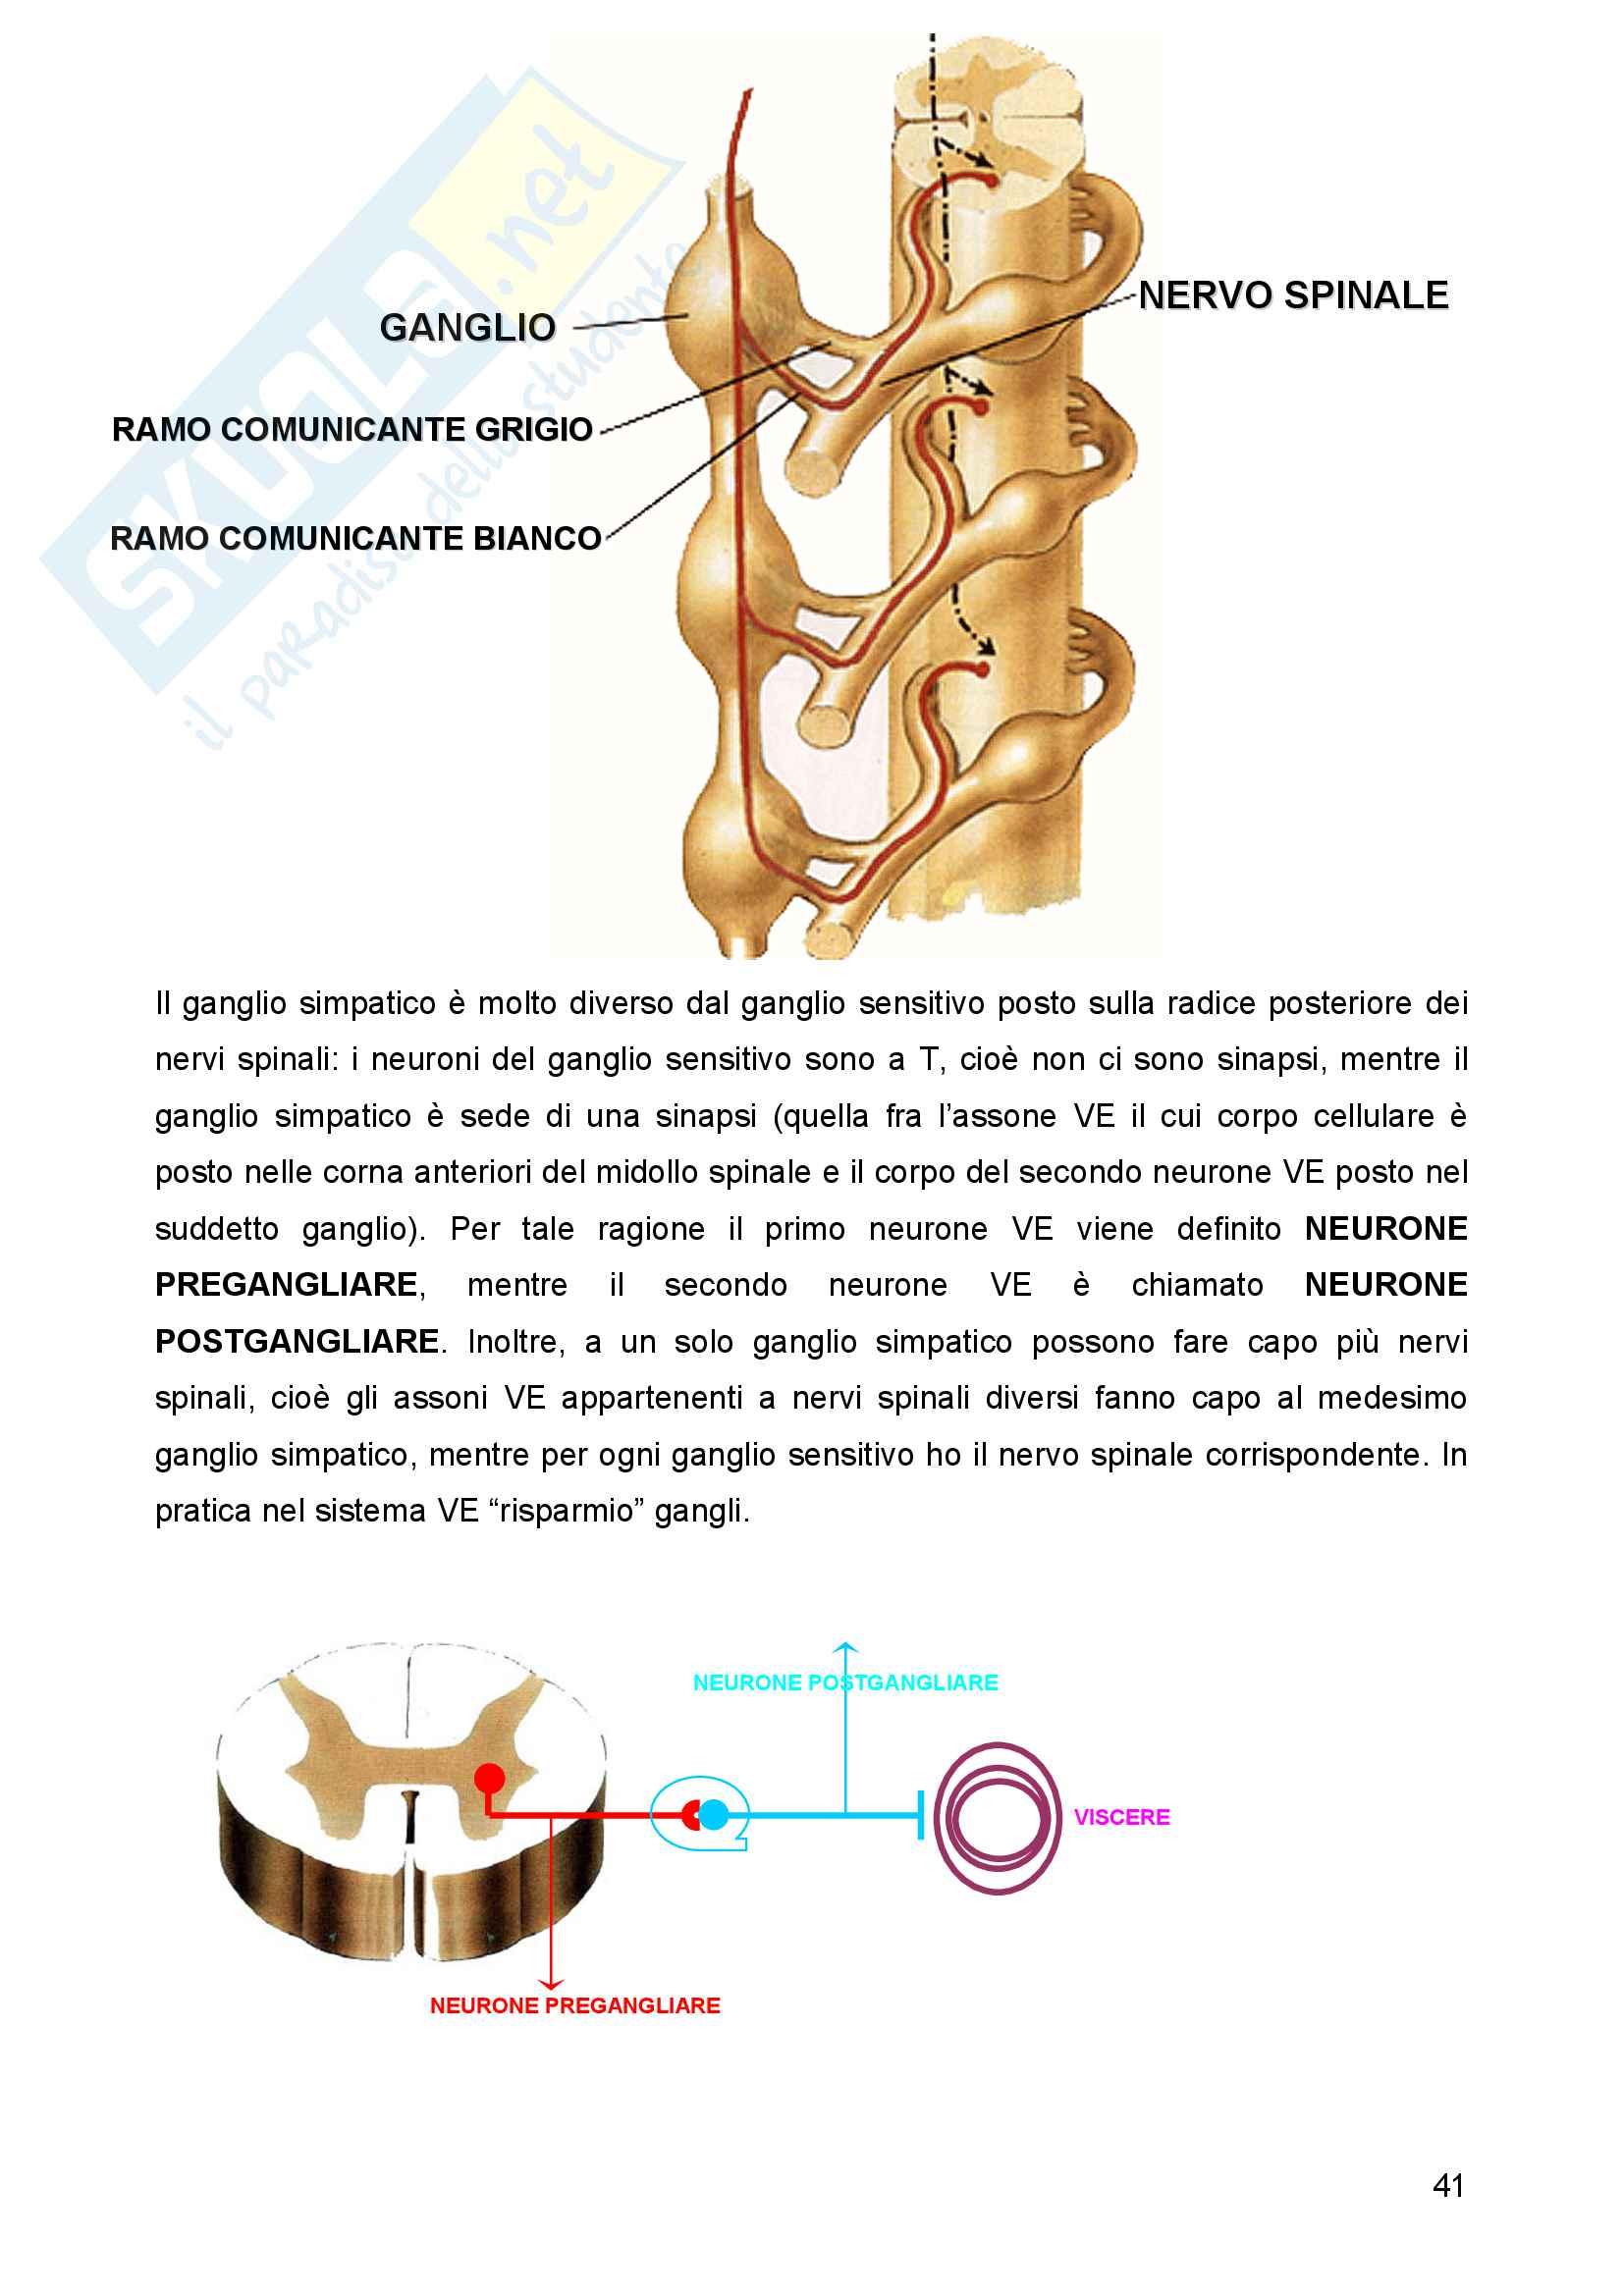 Sistema nervoso Pag. 41